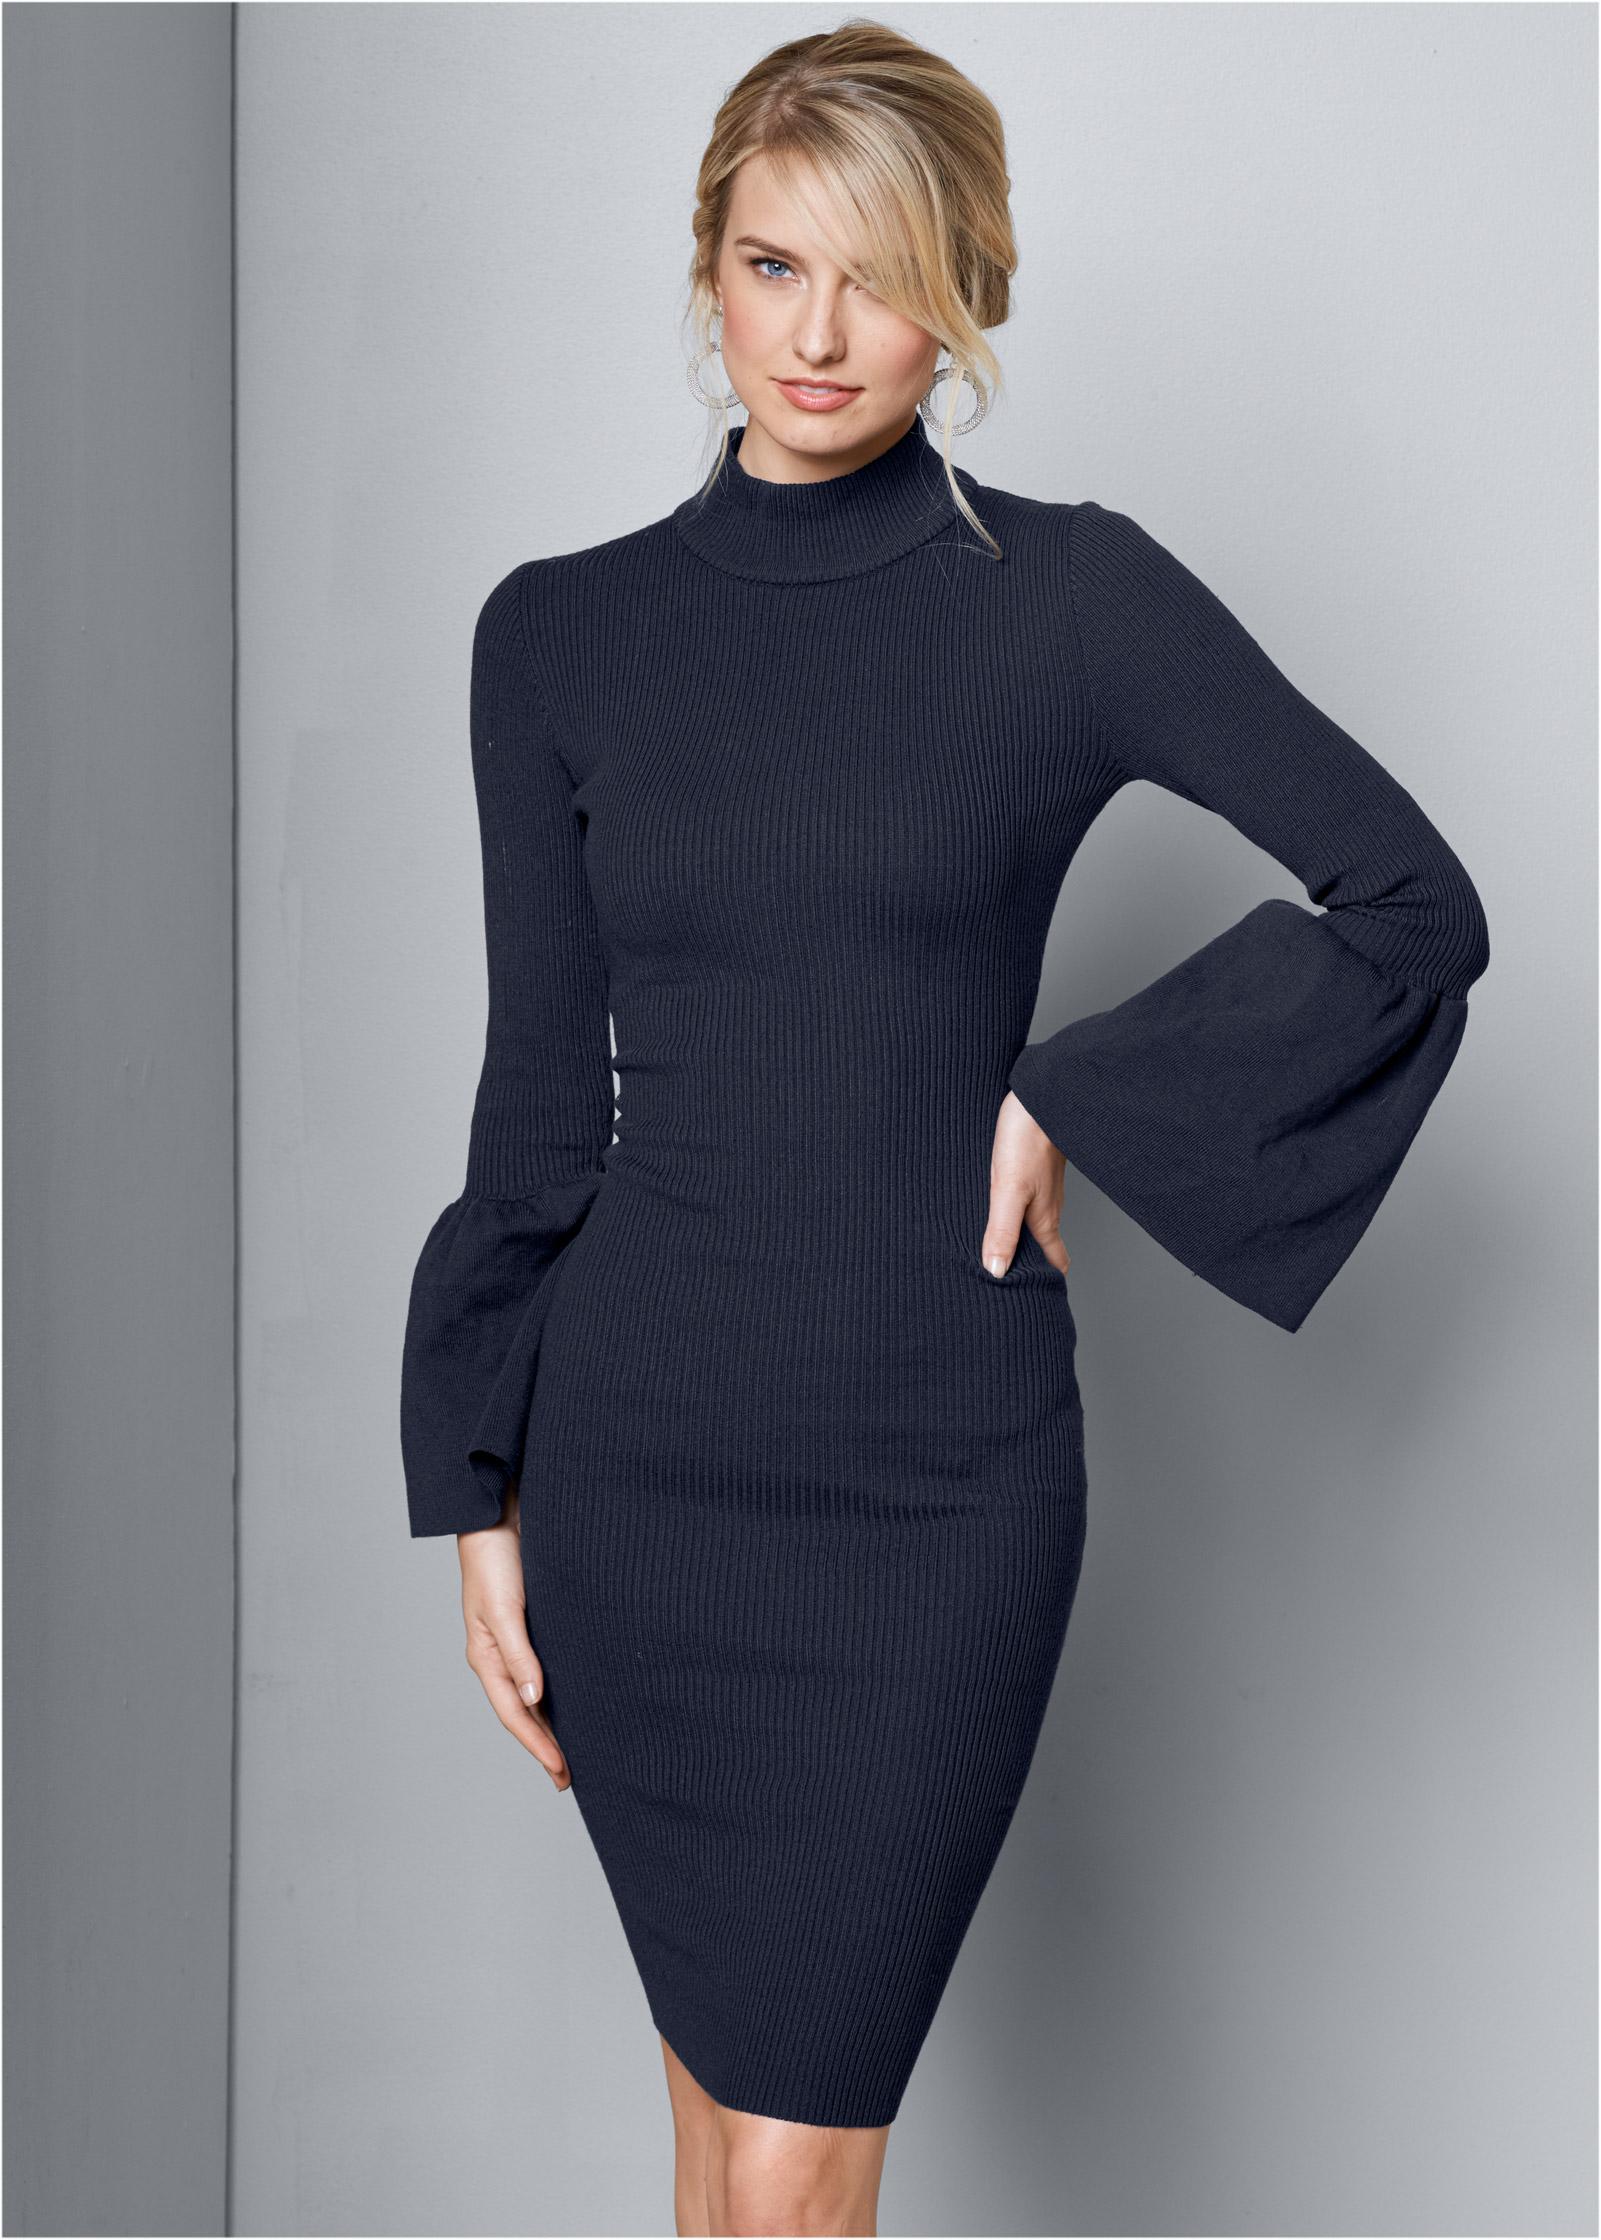 Long Sleeve Black Turtleneck Sweater Dress